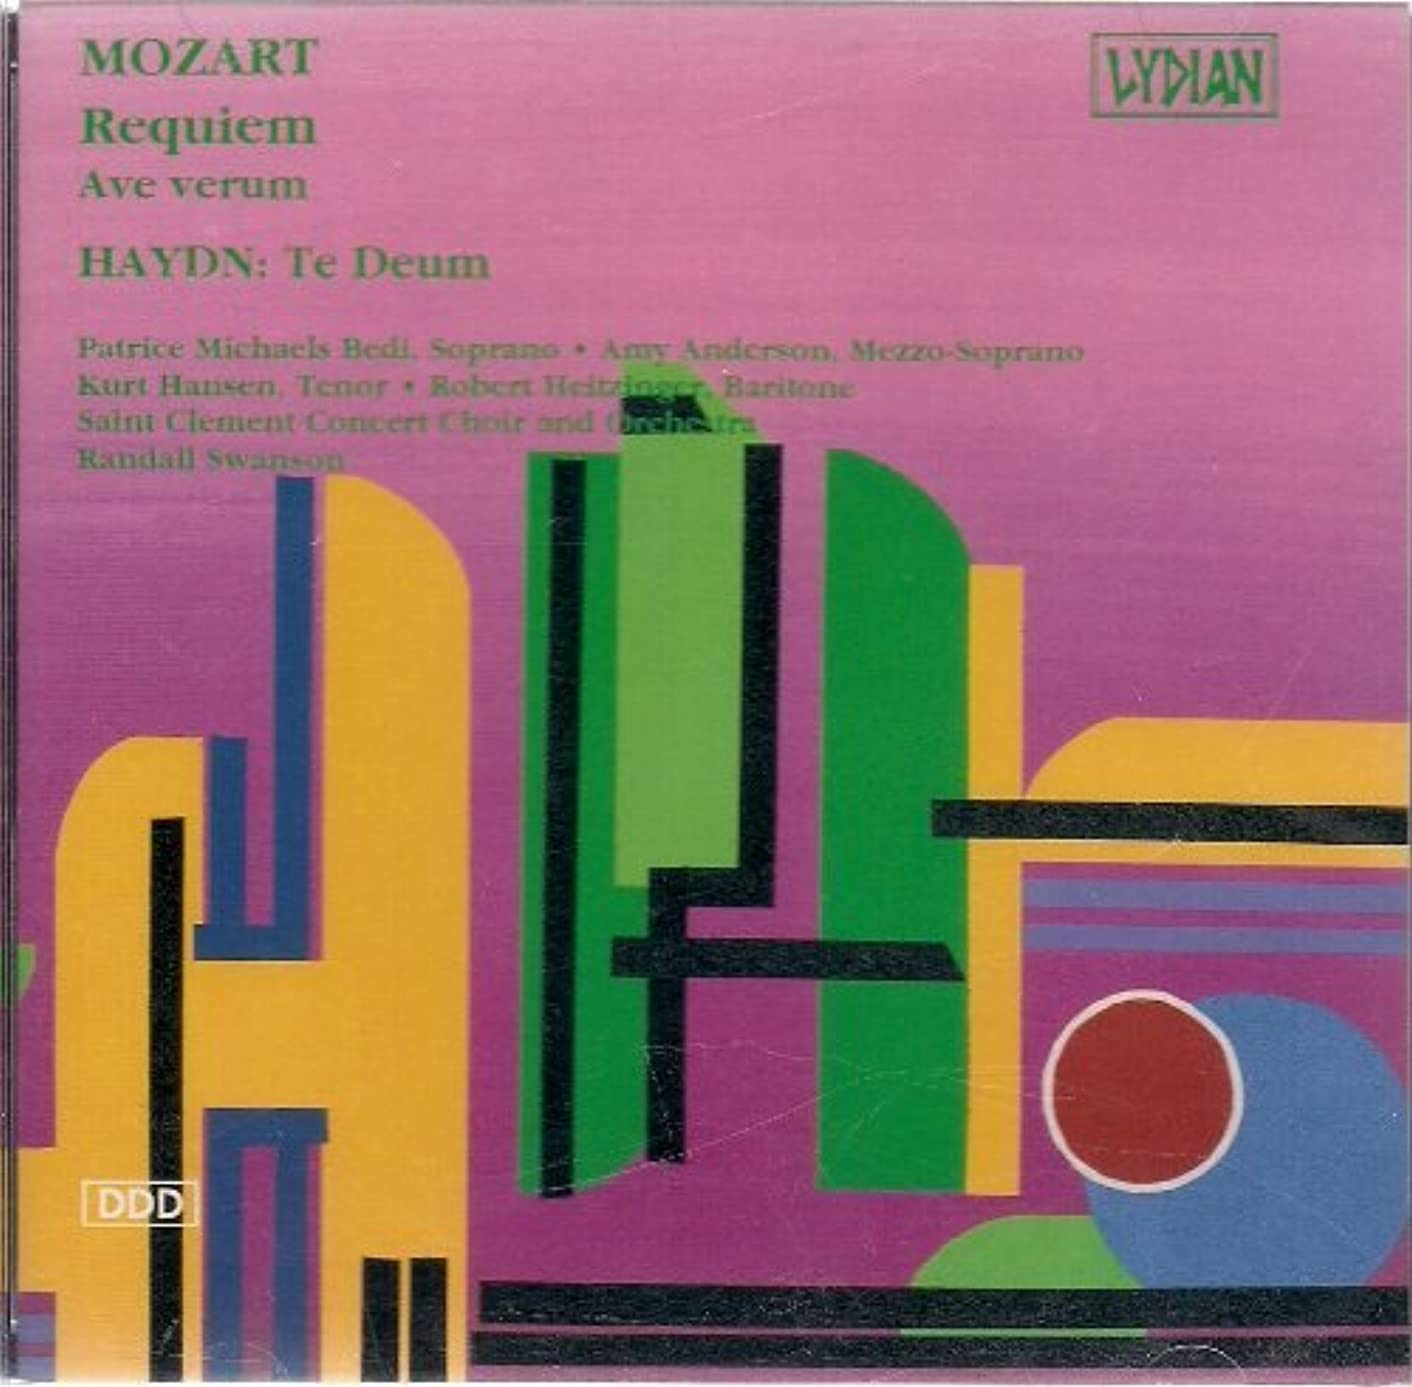 Requiem/Te Deum by Mozart